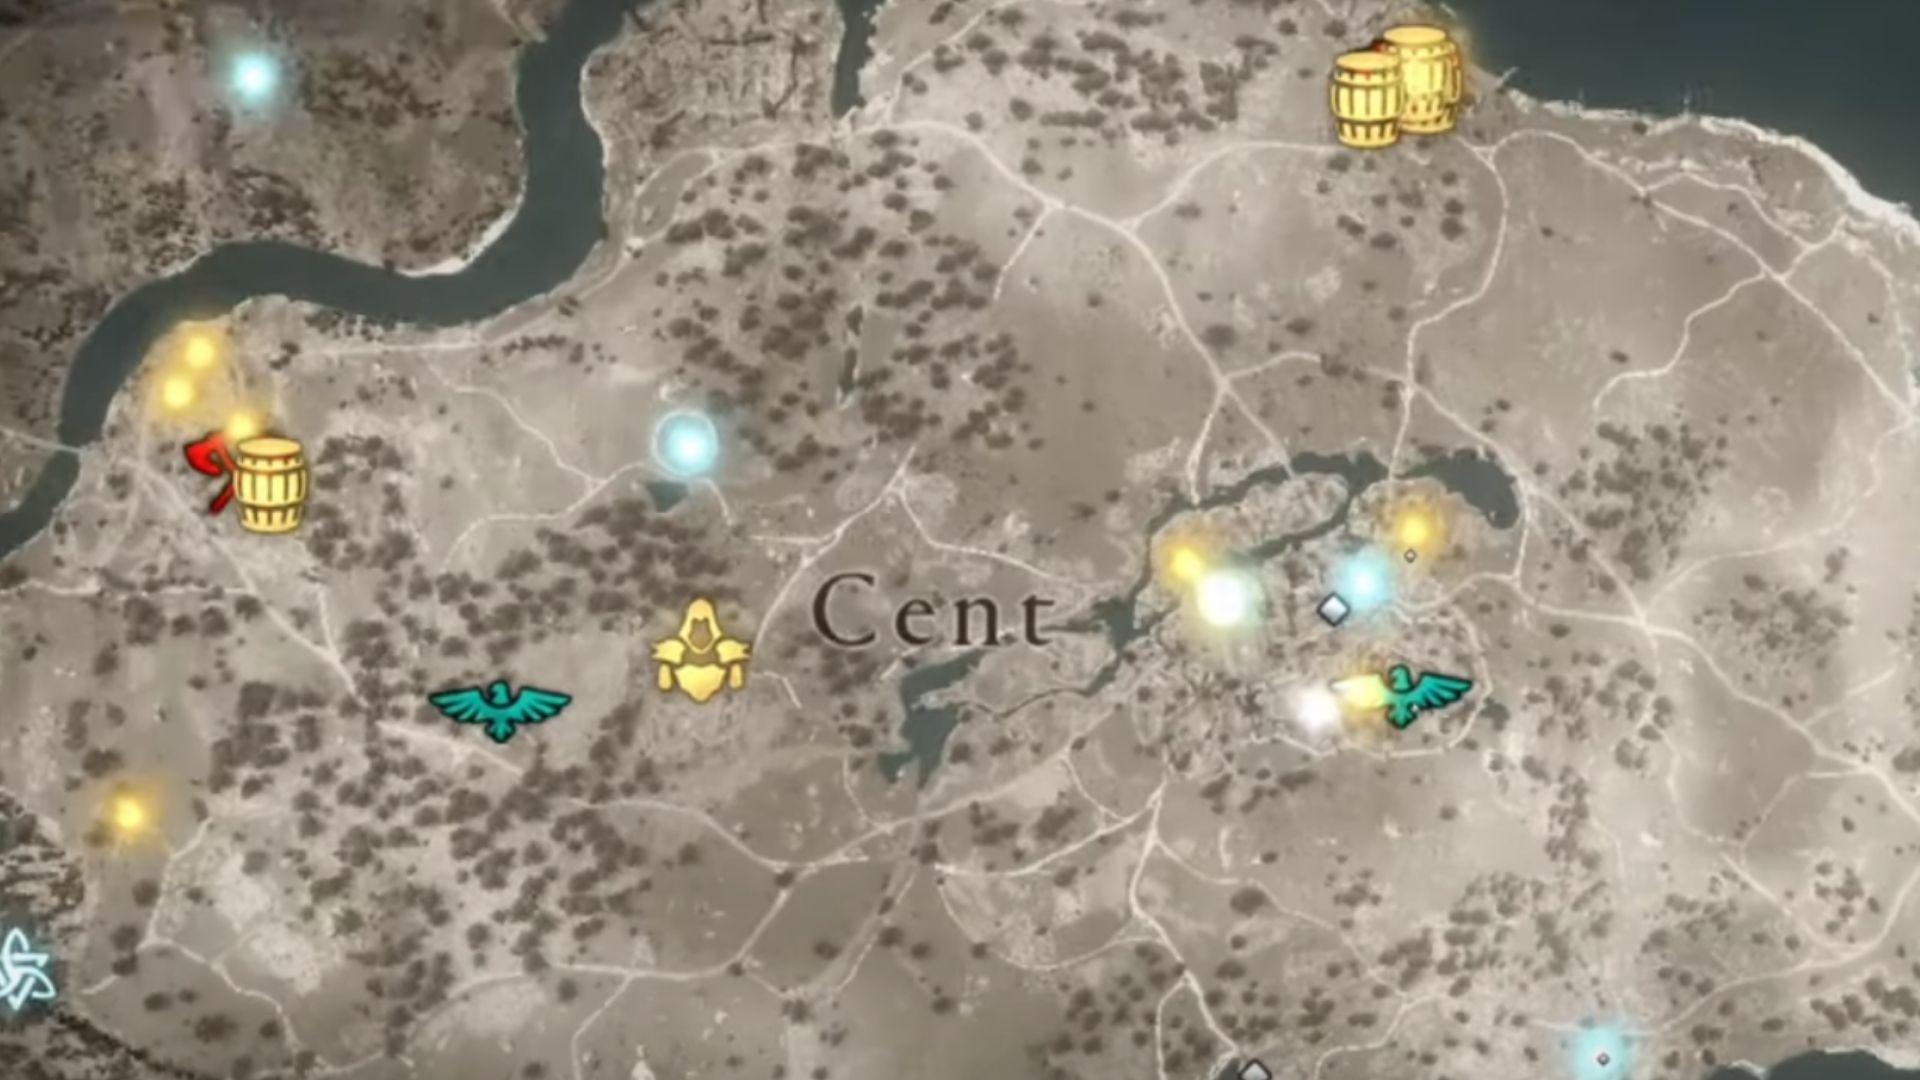 Cent map location